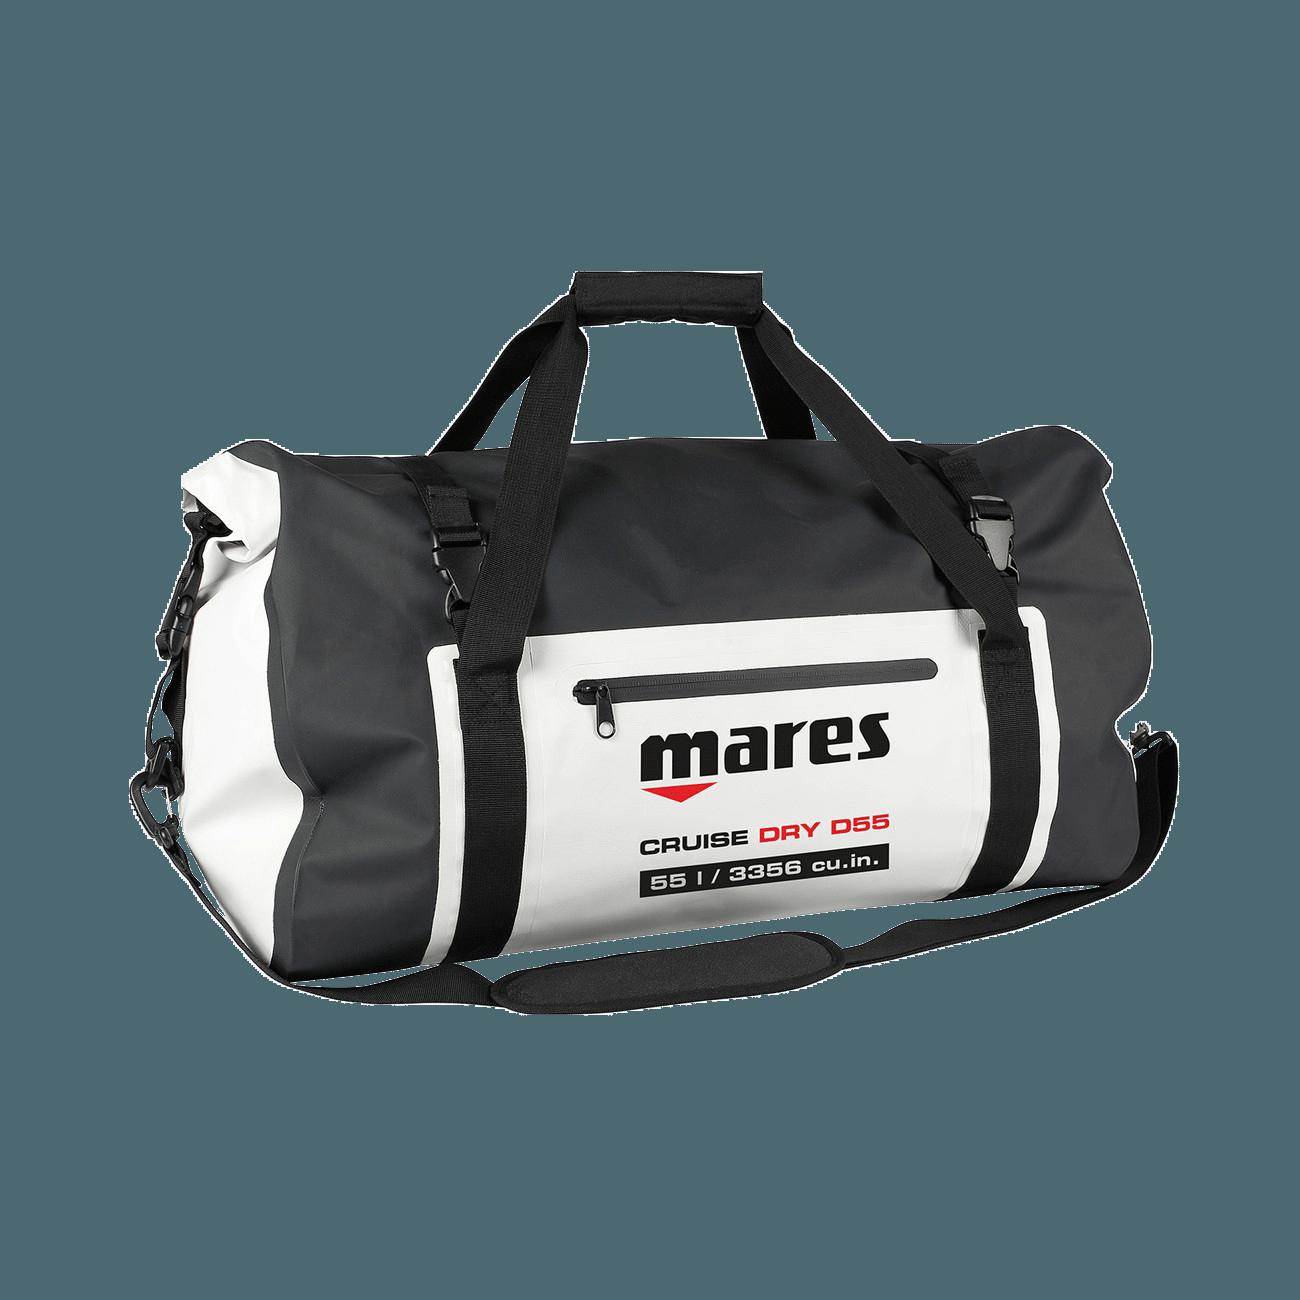 Mares D55 Dry Bag | Mares Bags | Mares Singapore